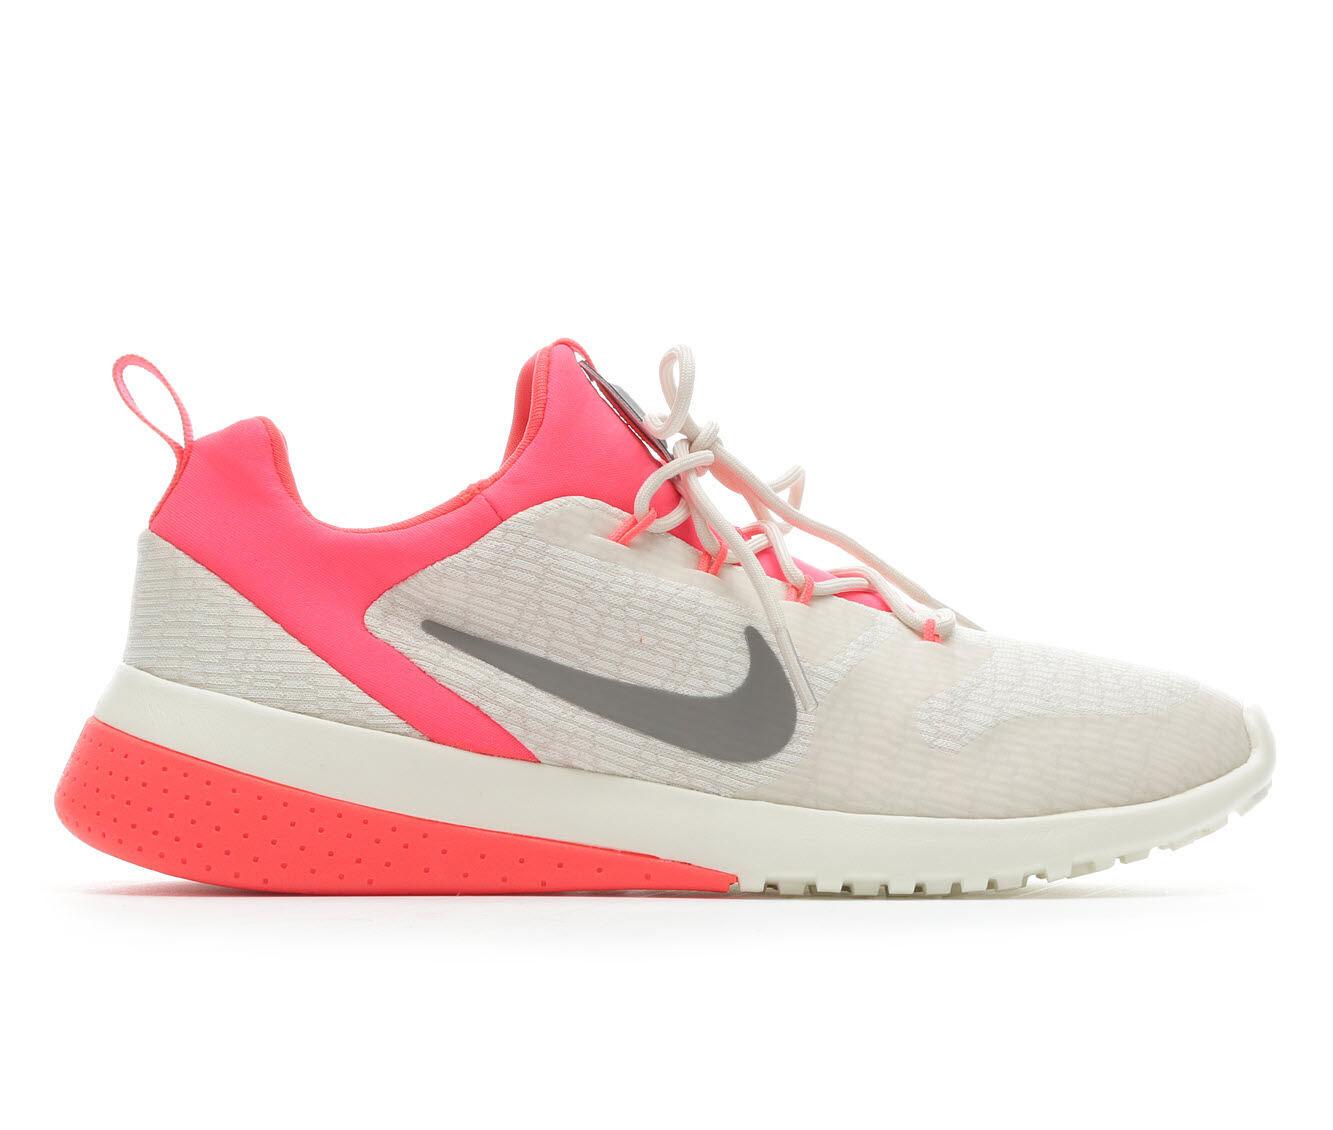 Nike CK RACER Damen Sneaker